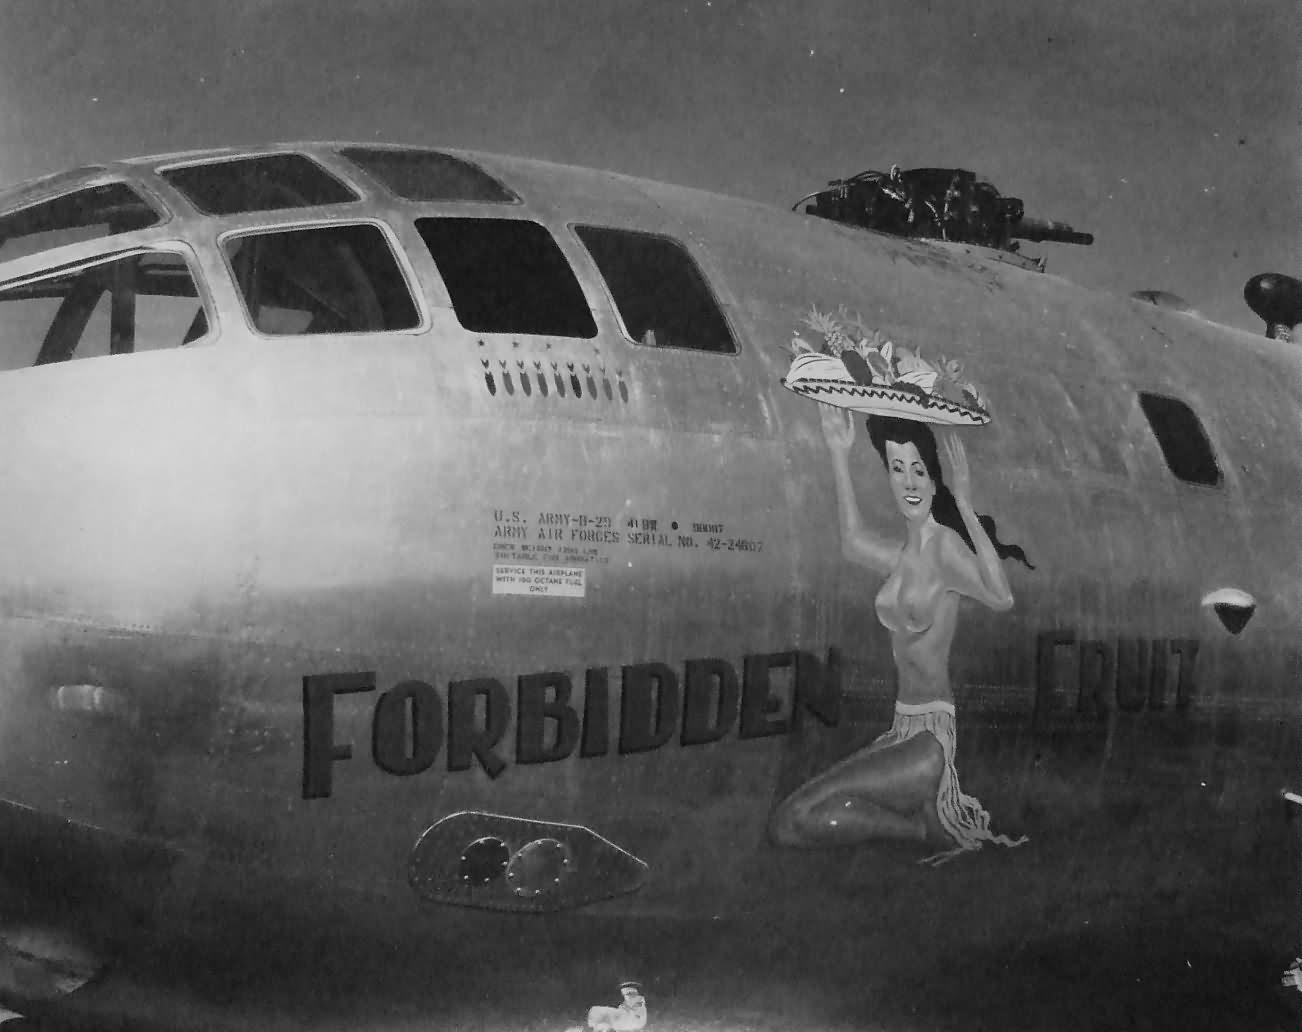 B-29 bomber 498th bomb group 875th squadron FORBIDDEN FRUIT 42-24607 Tinian 1945